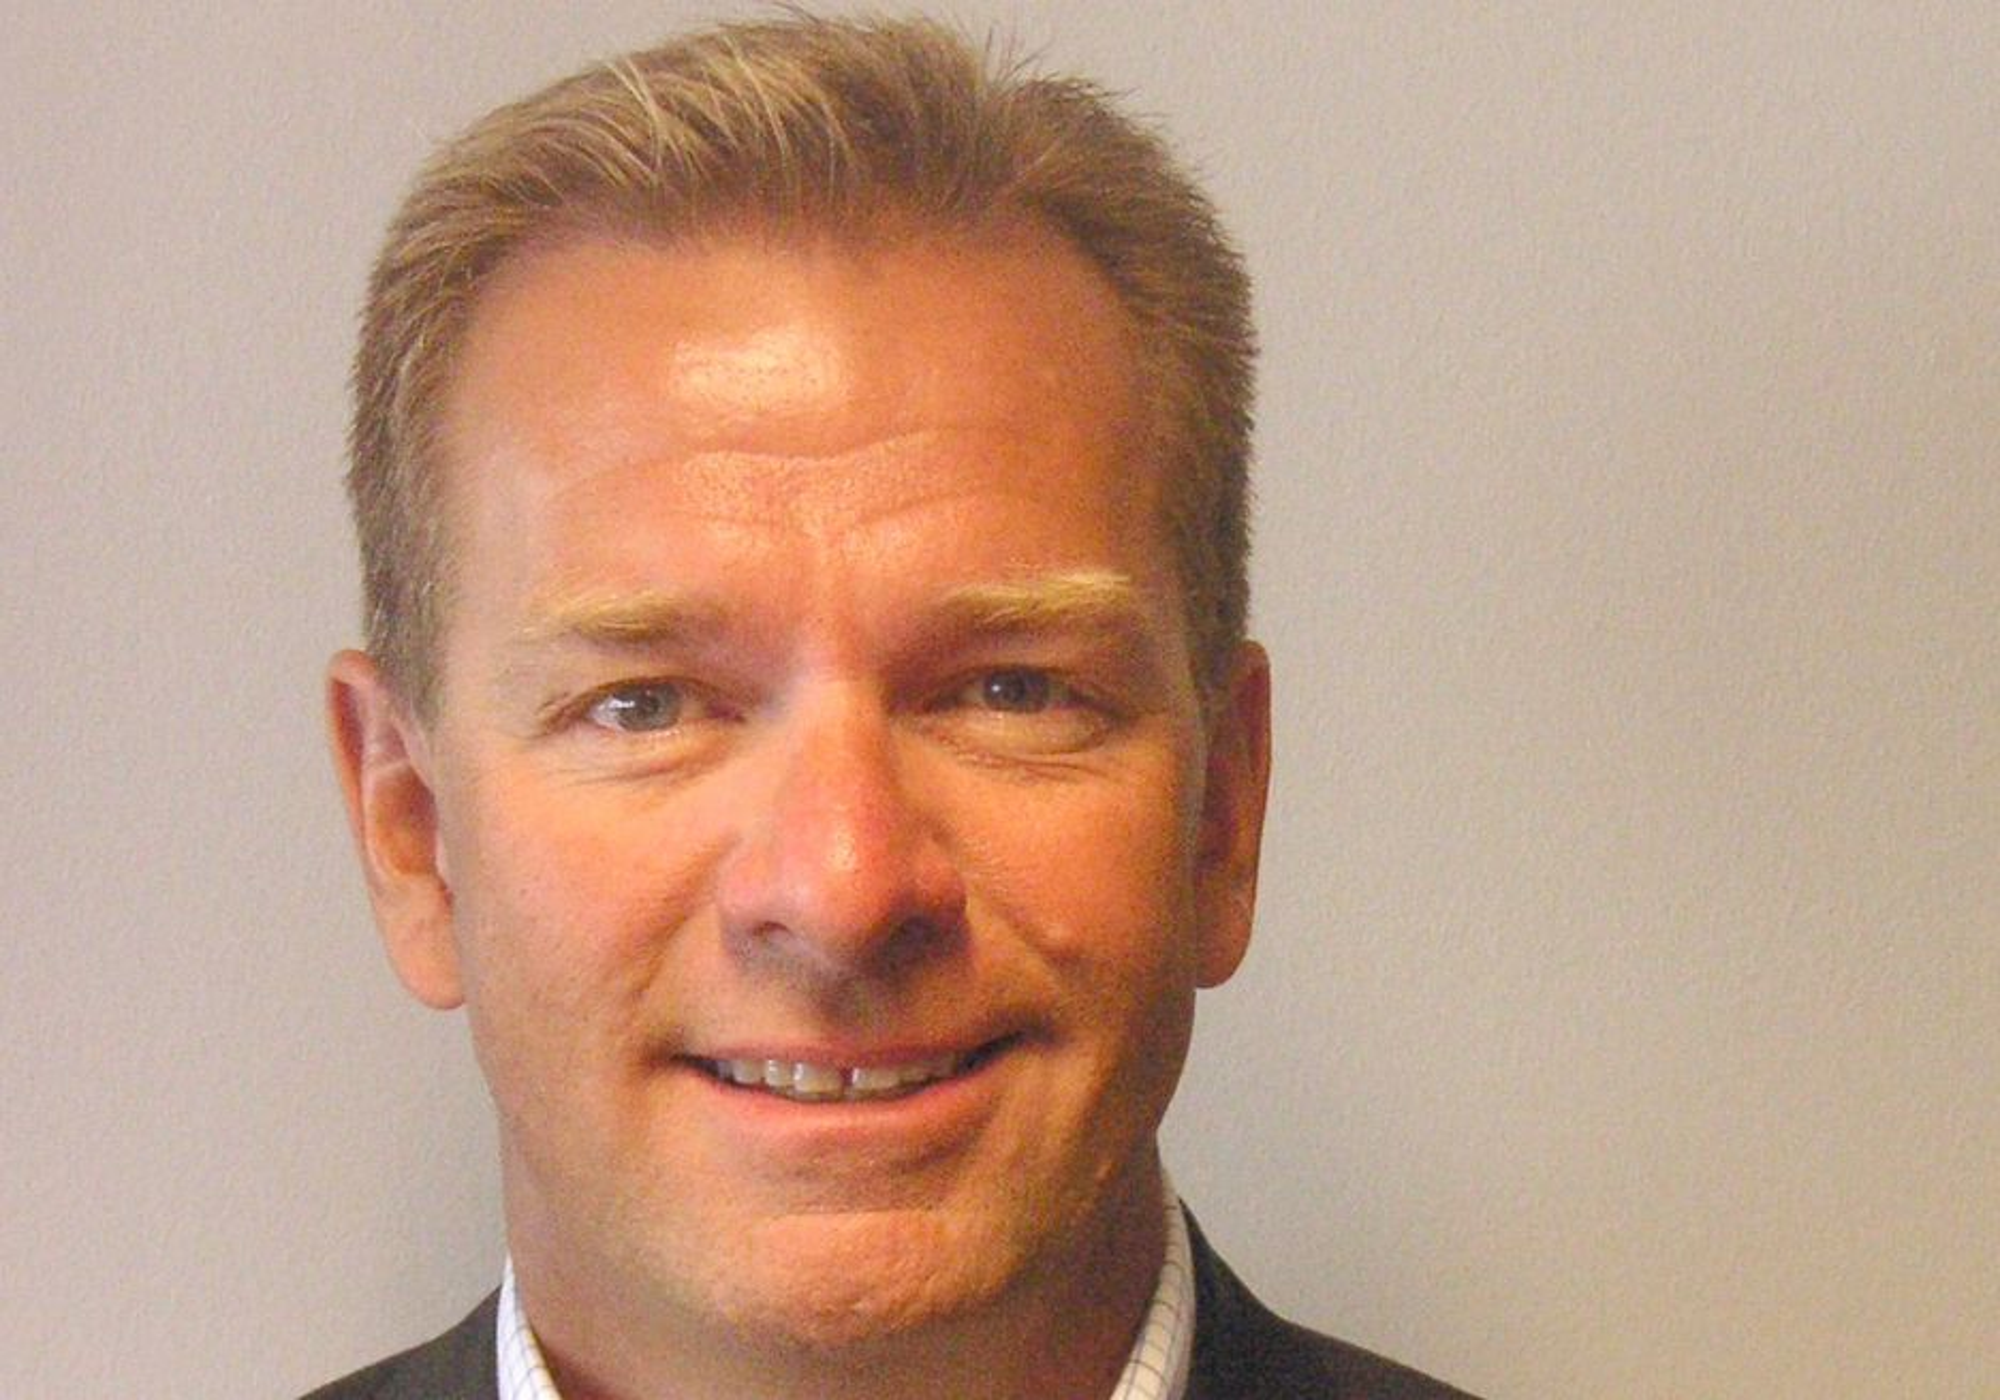 FÅR NYTT VISITTKORT: Jan Søgaard blir snart en del av staben i IPnett.